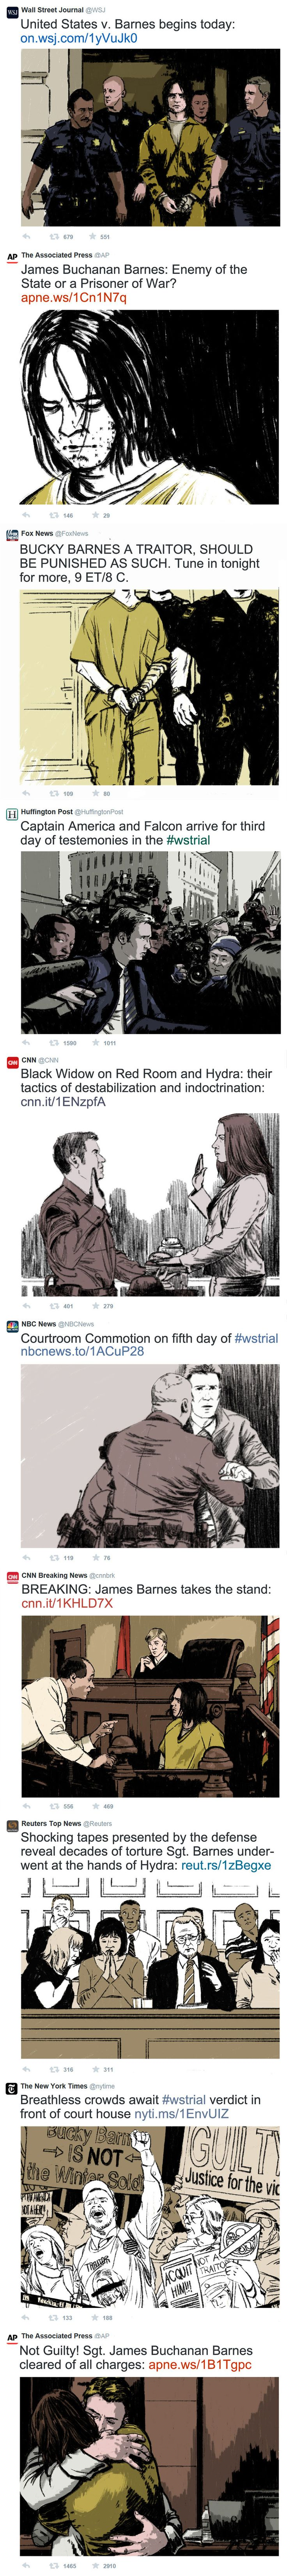 """The Winter Soldier Trial"" || Bucky Barnes, Steve Rogers, Sam Wilson, Natasha Romanoff || by Paperflower86 || #fanart"